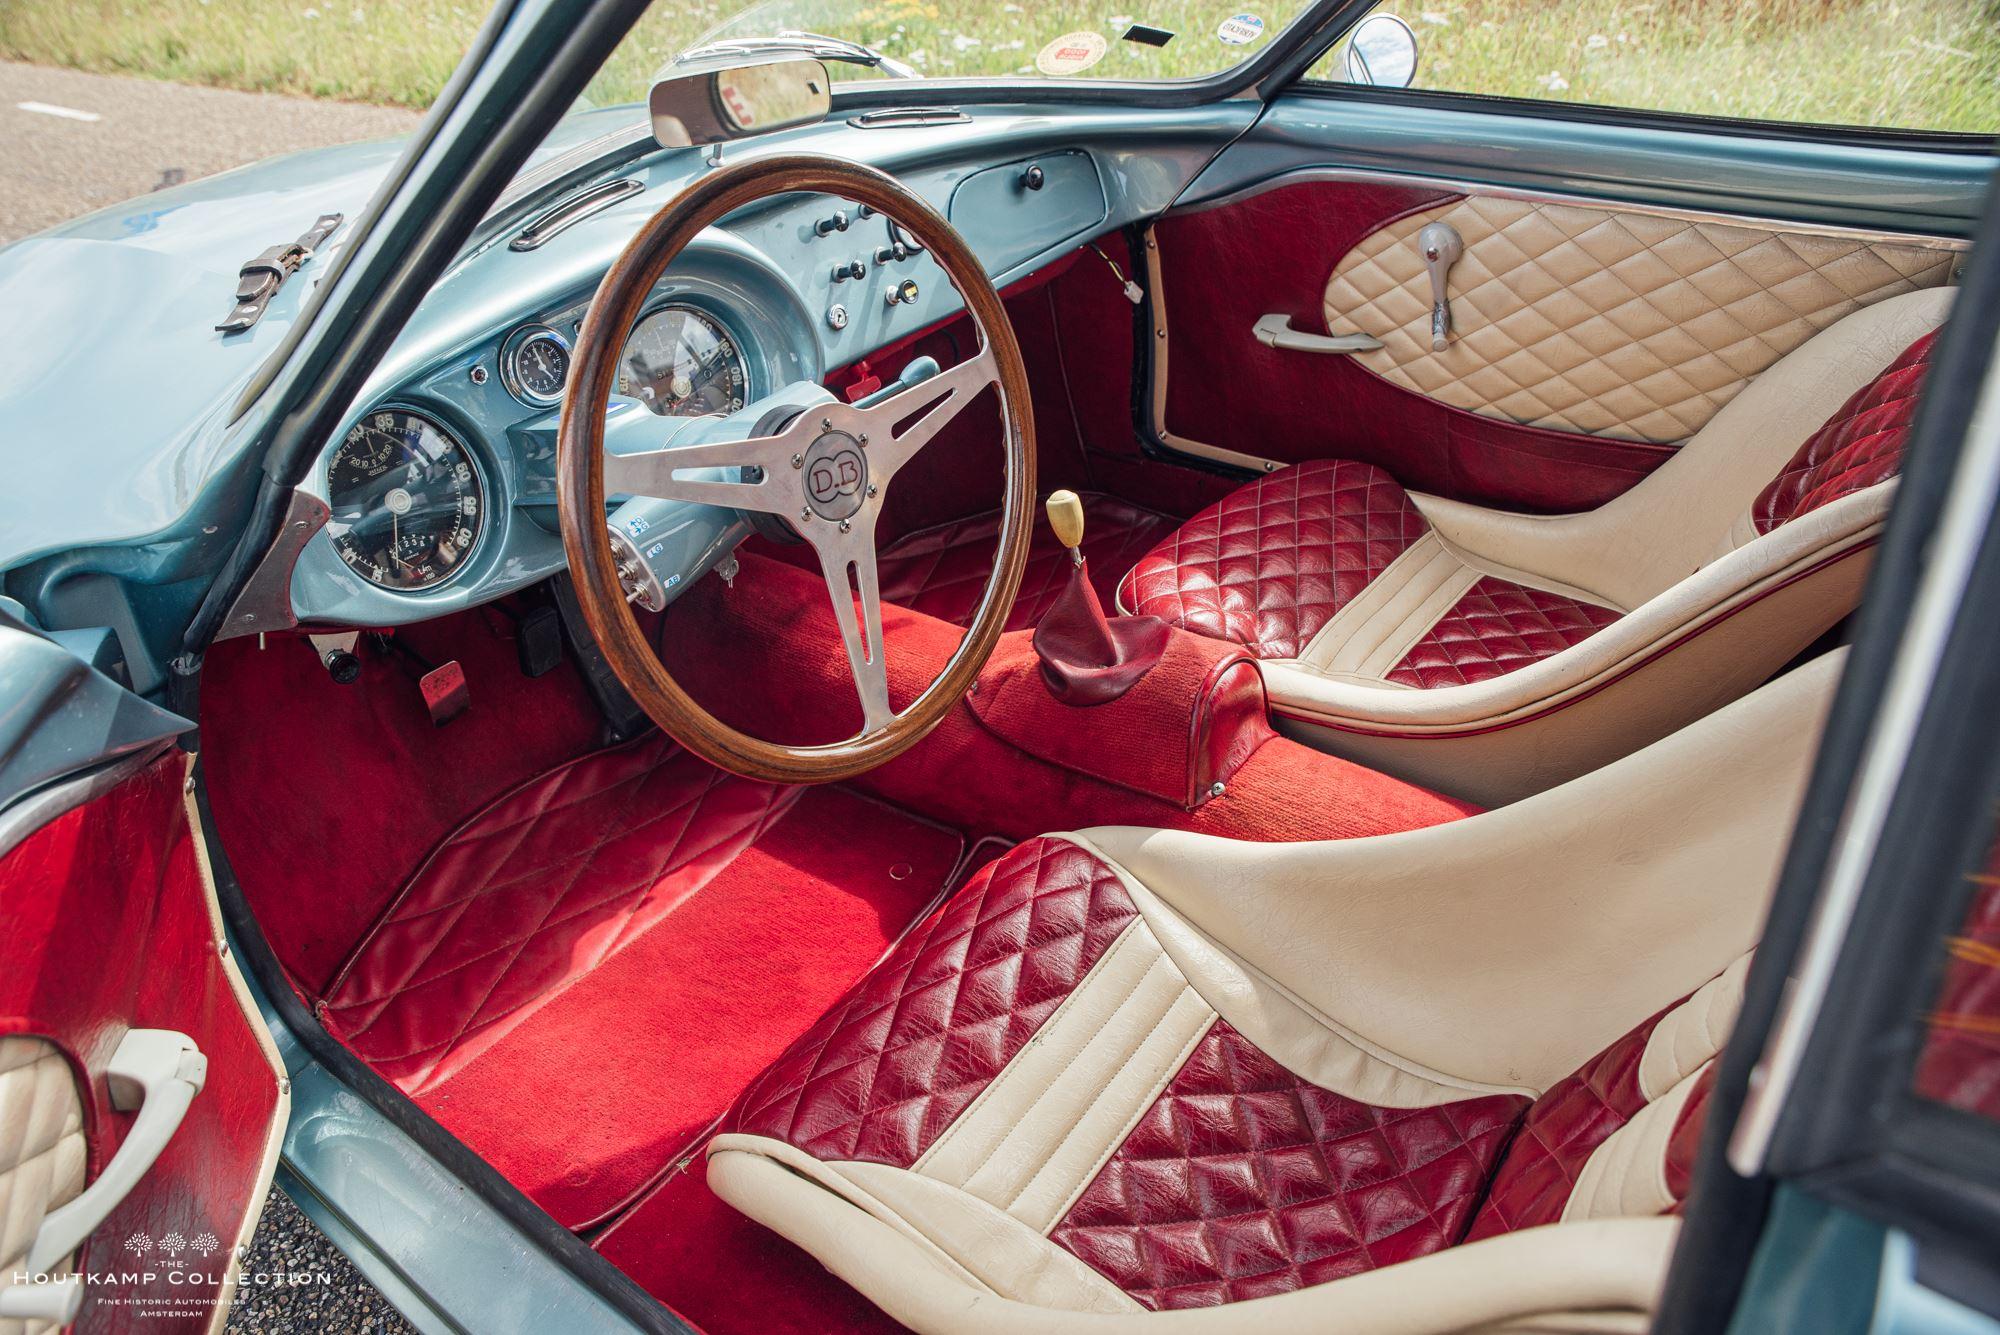 1956-DB-HBR-5-Race-car-Mille-Miglia-1957-(12)